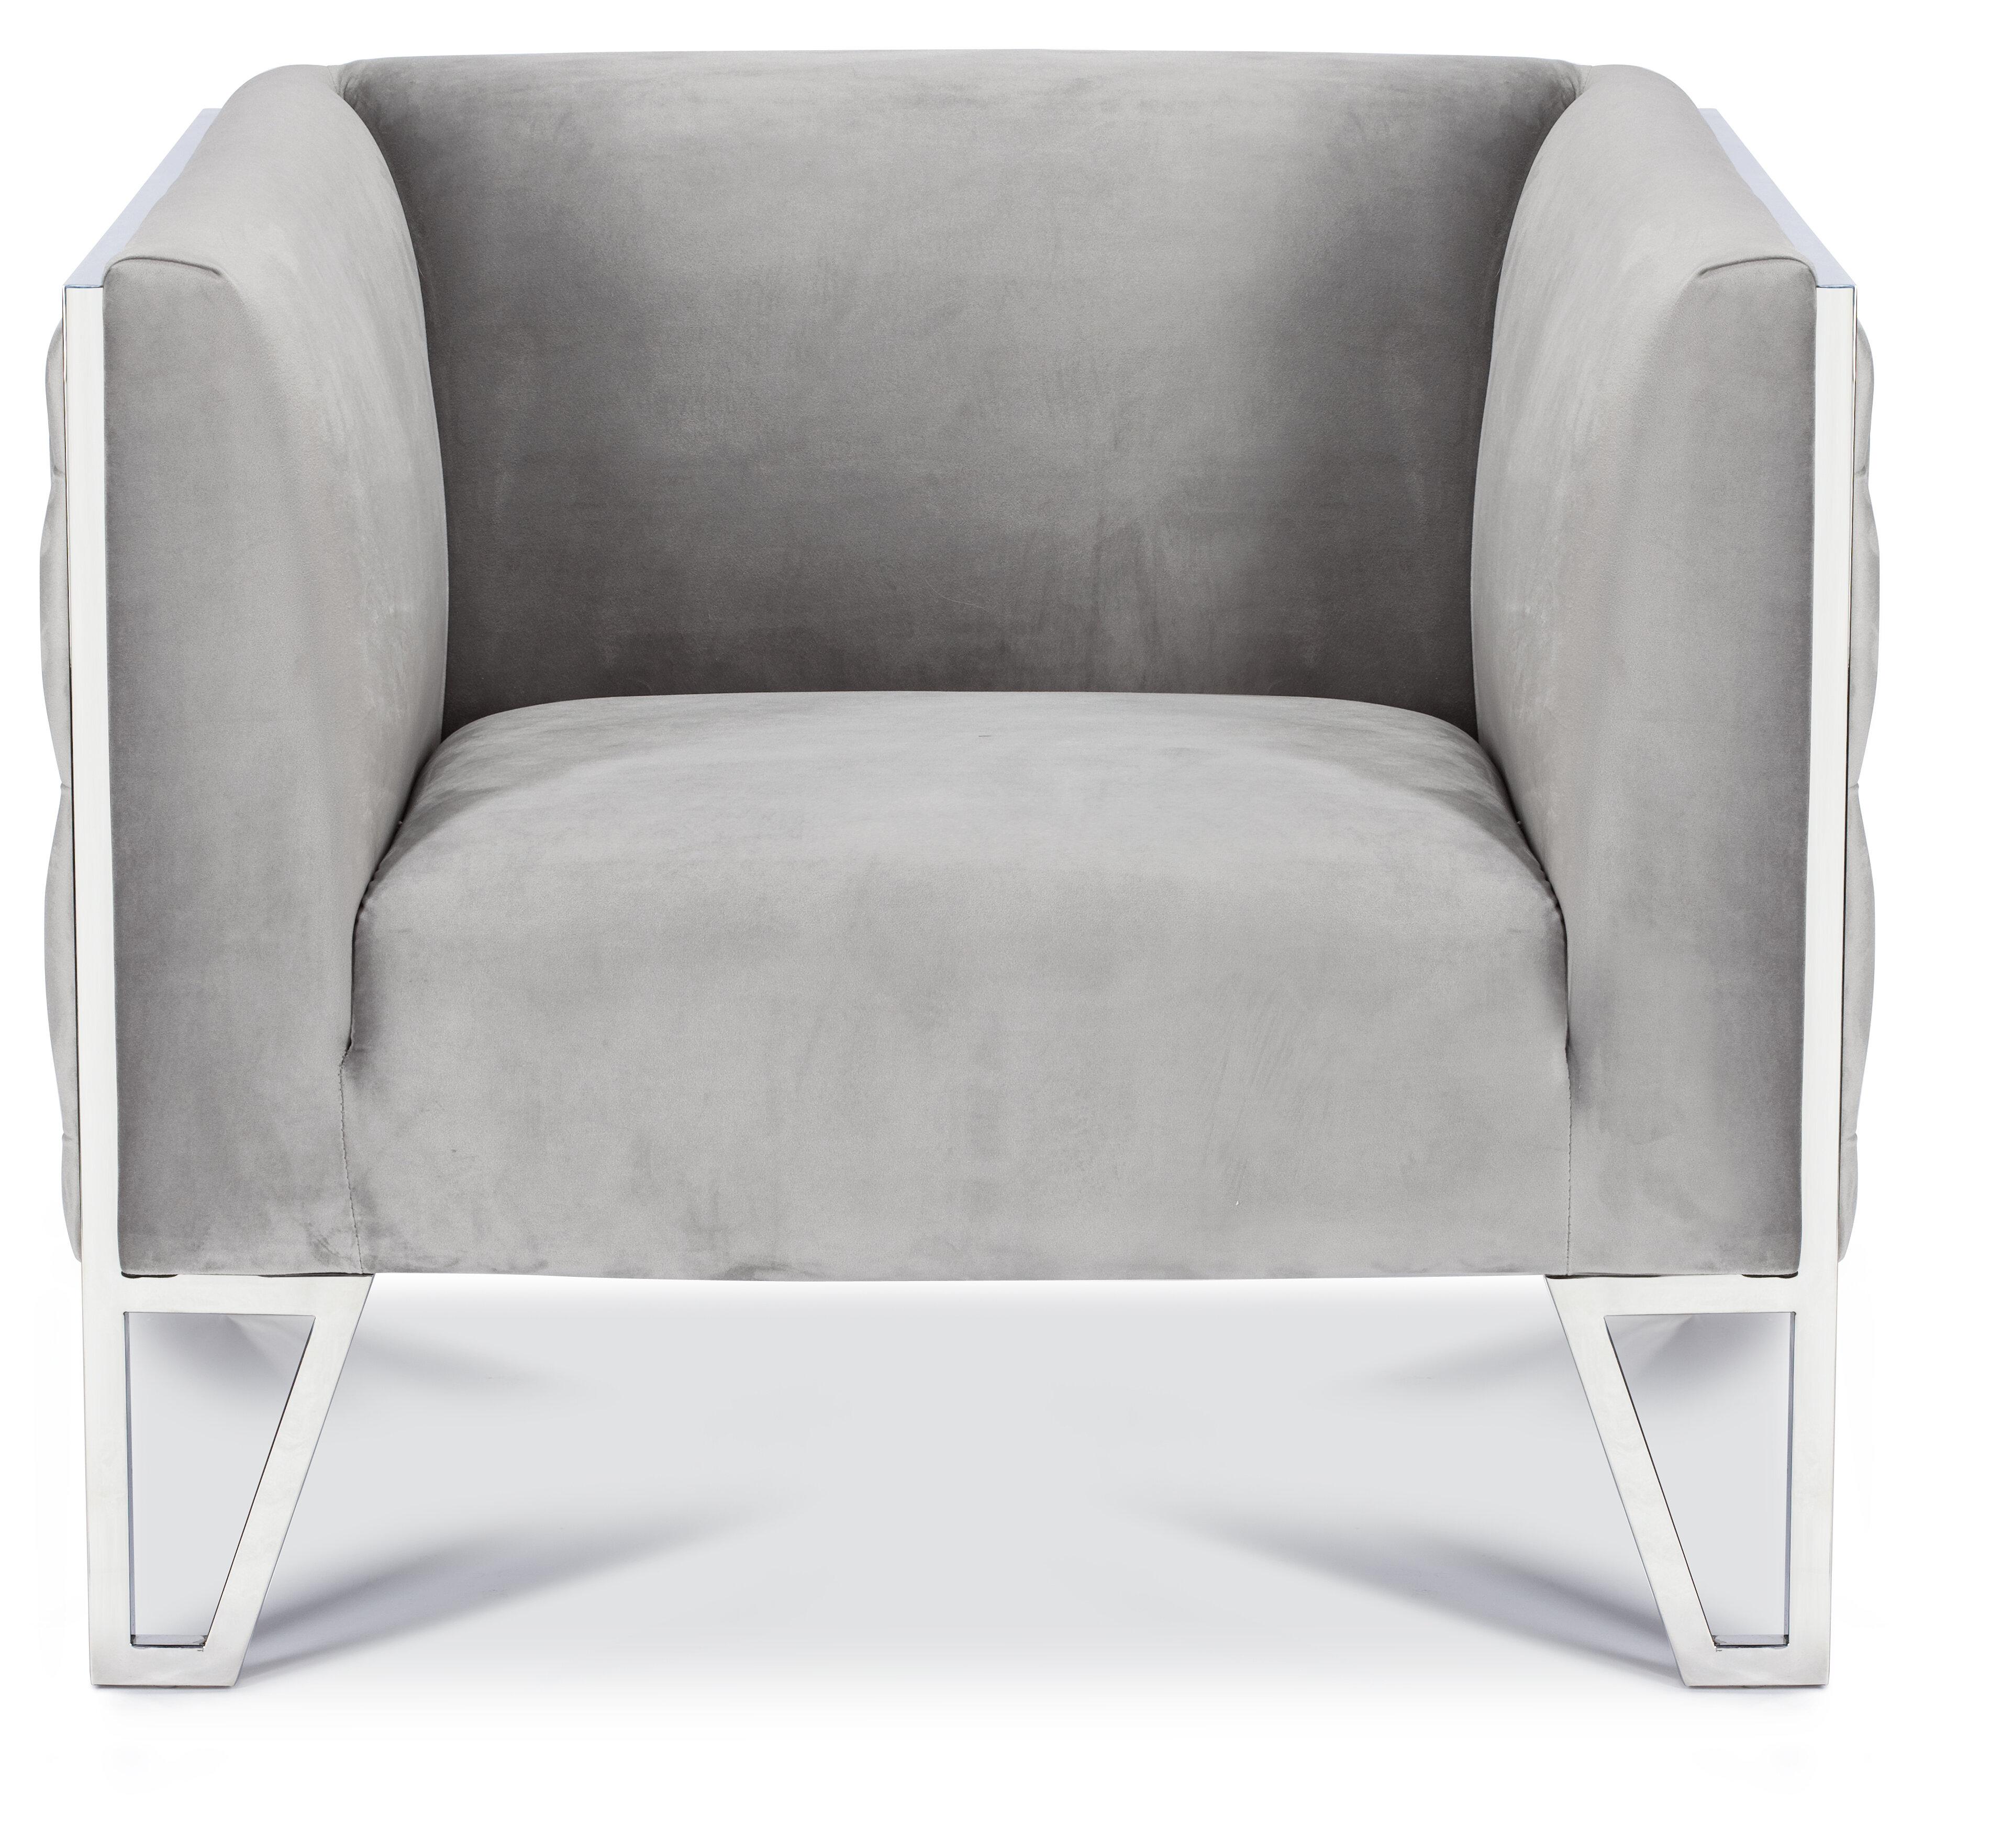 Sensational Cotten Side Chair Frankydiablos Diy Chair Ideas Frankydiabloscom